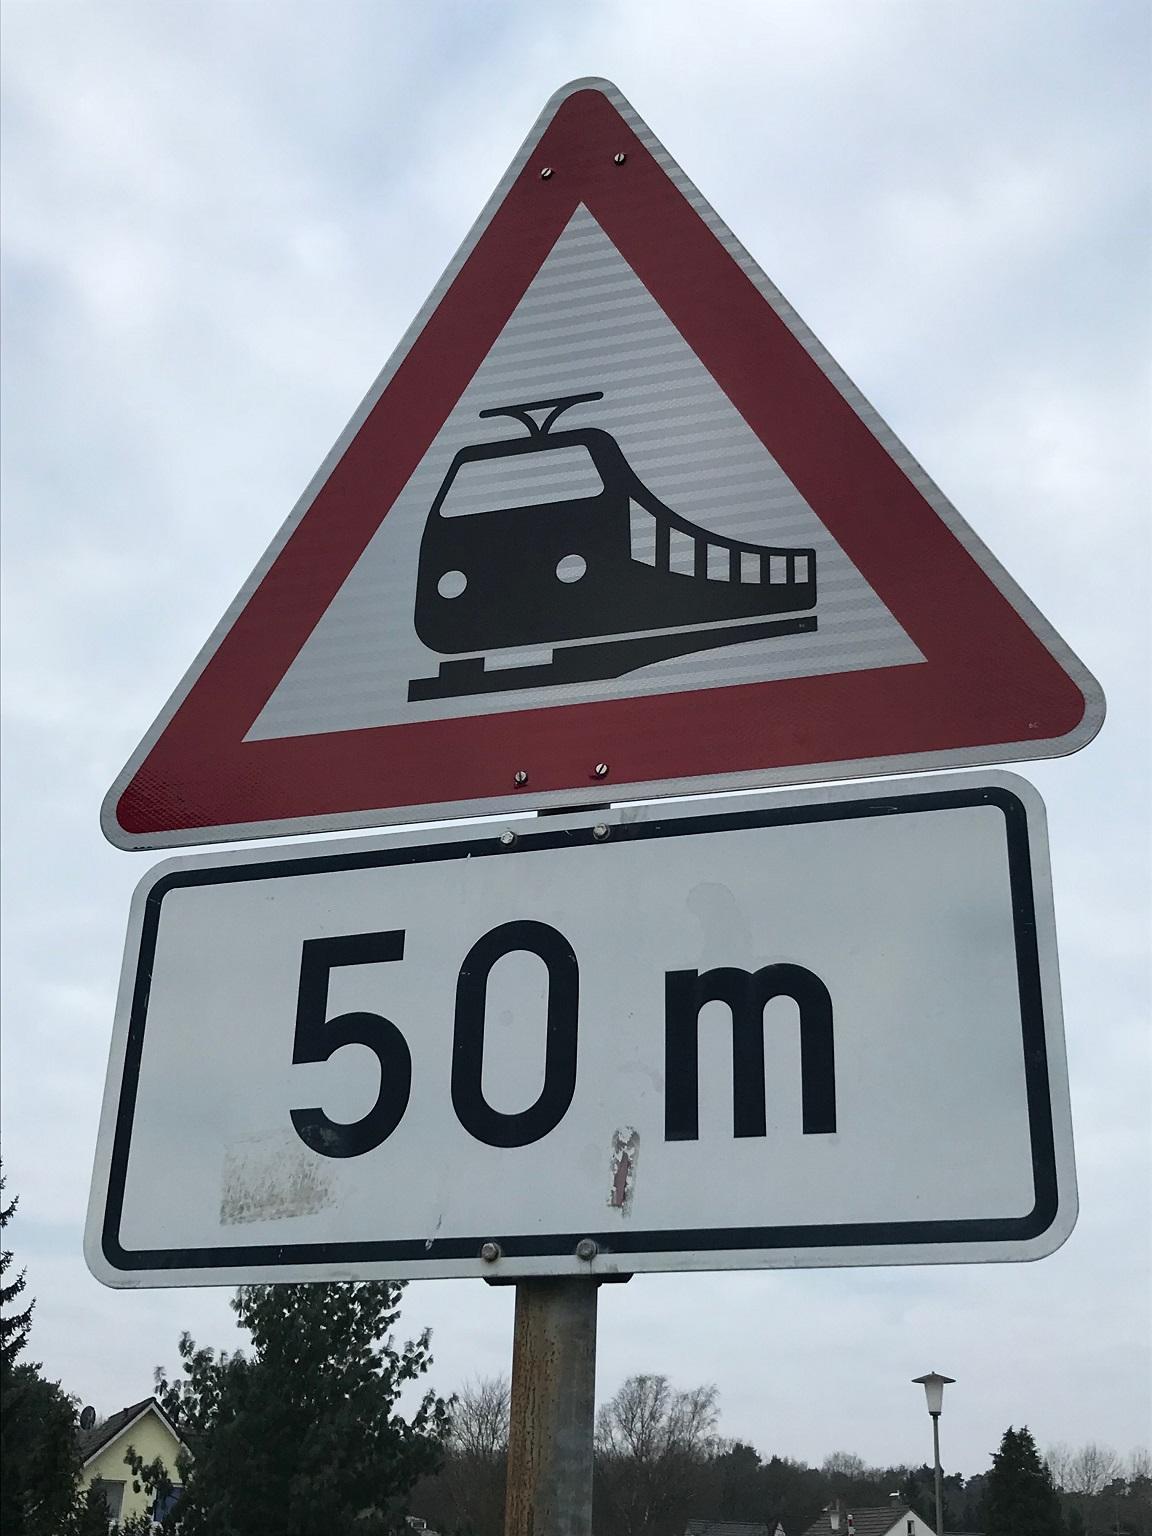 Need help optimizing training setup to detect all german traffic